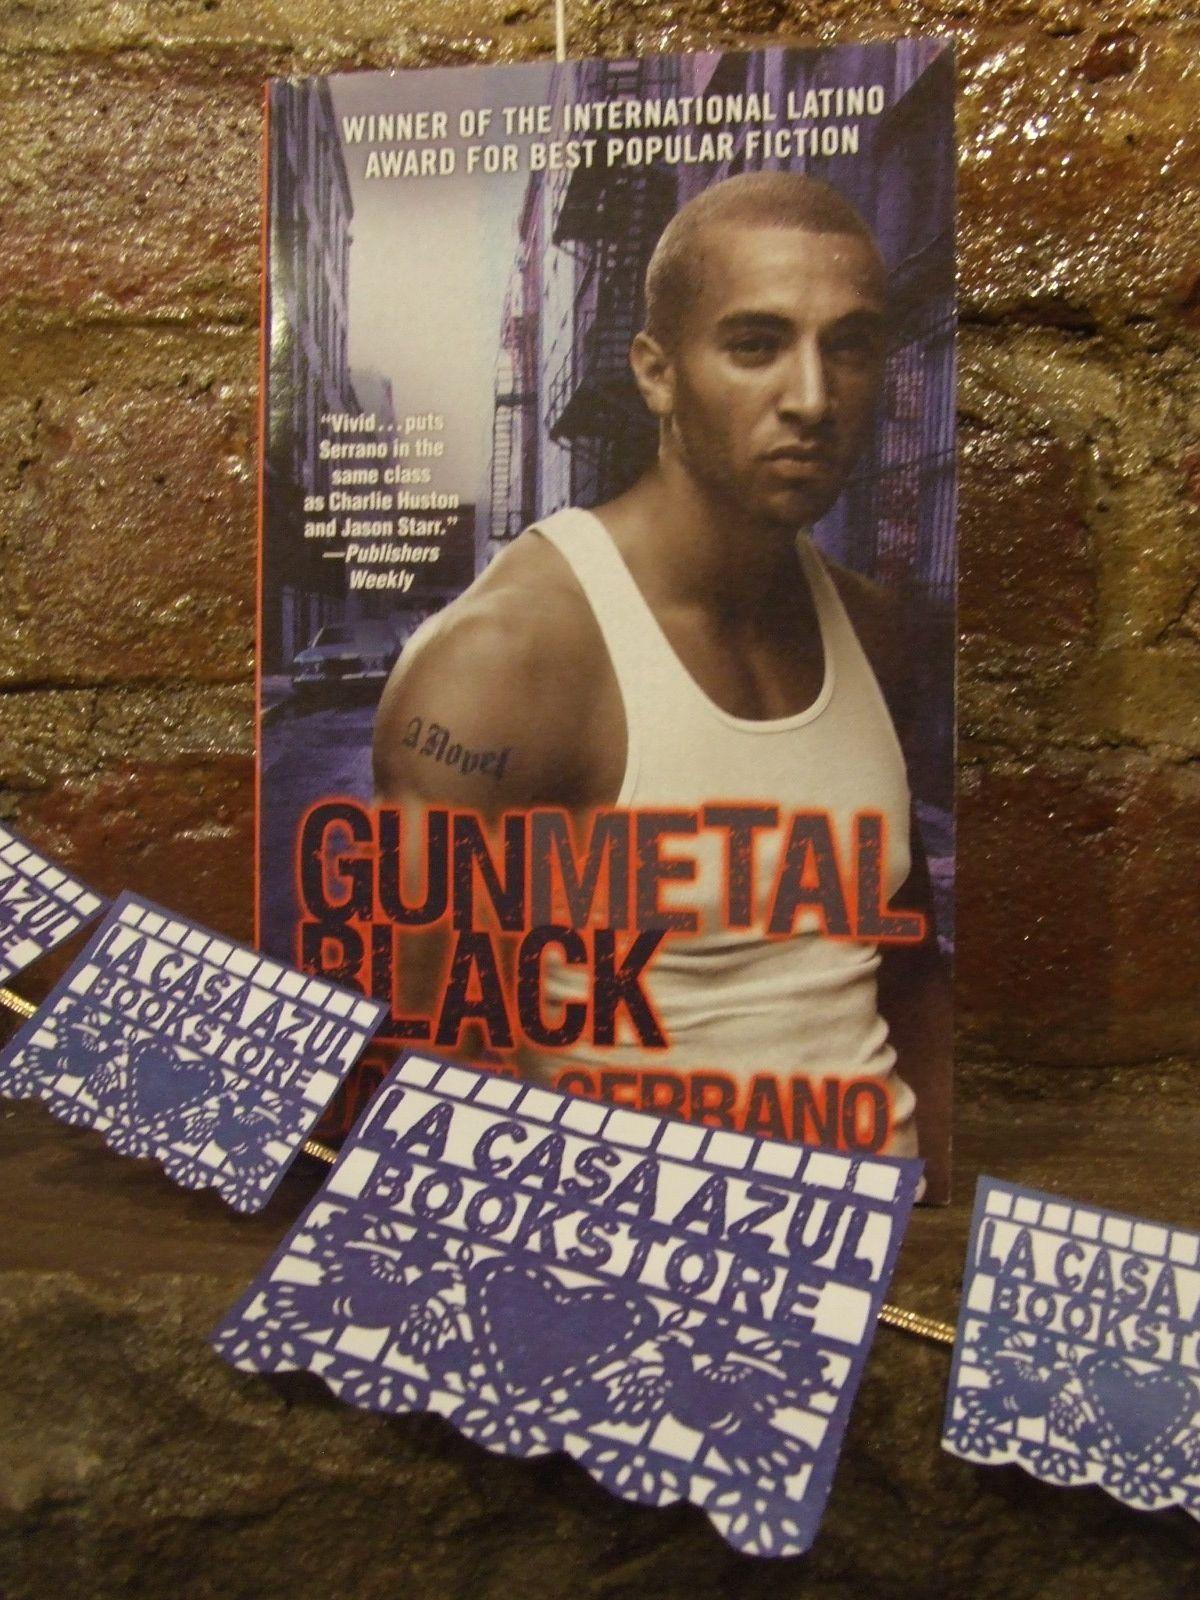 Gunmetal Black By Daniel Serrano Lacasaazulbooks Loves Latinolit Tank Man Gunmetal Starr